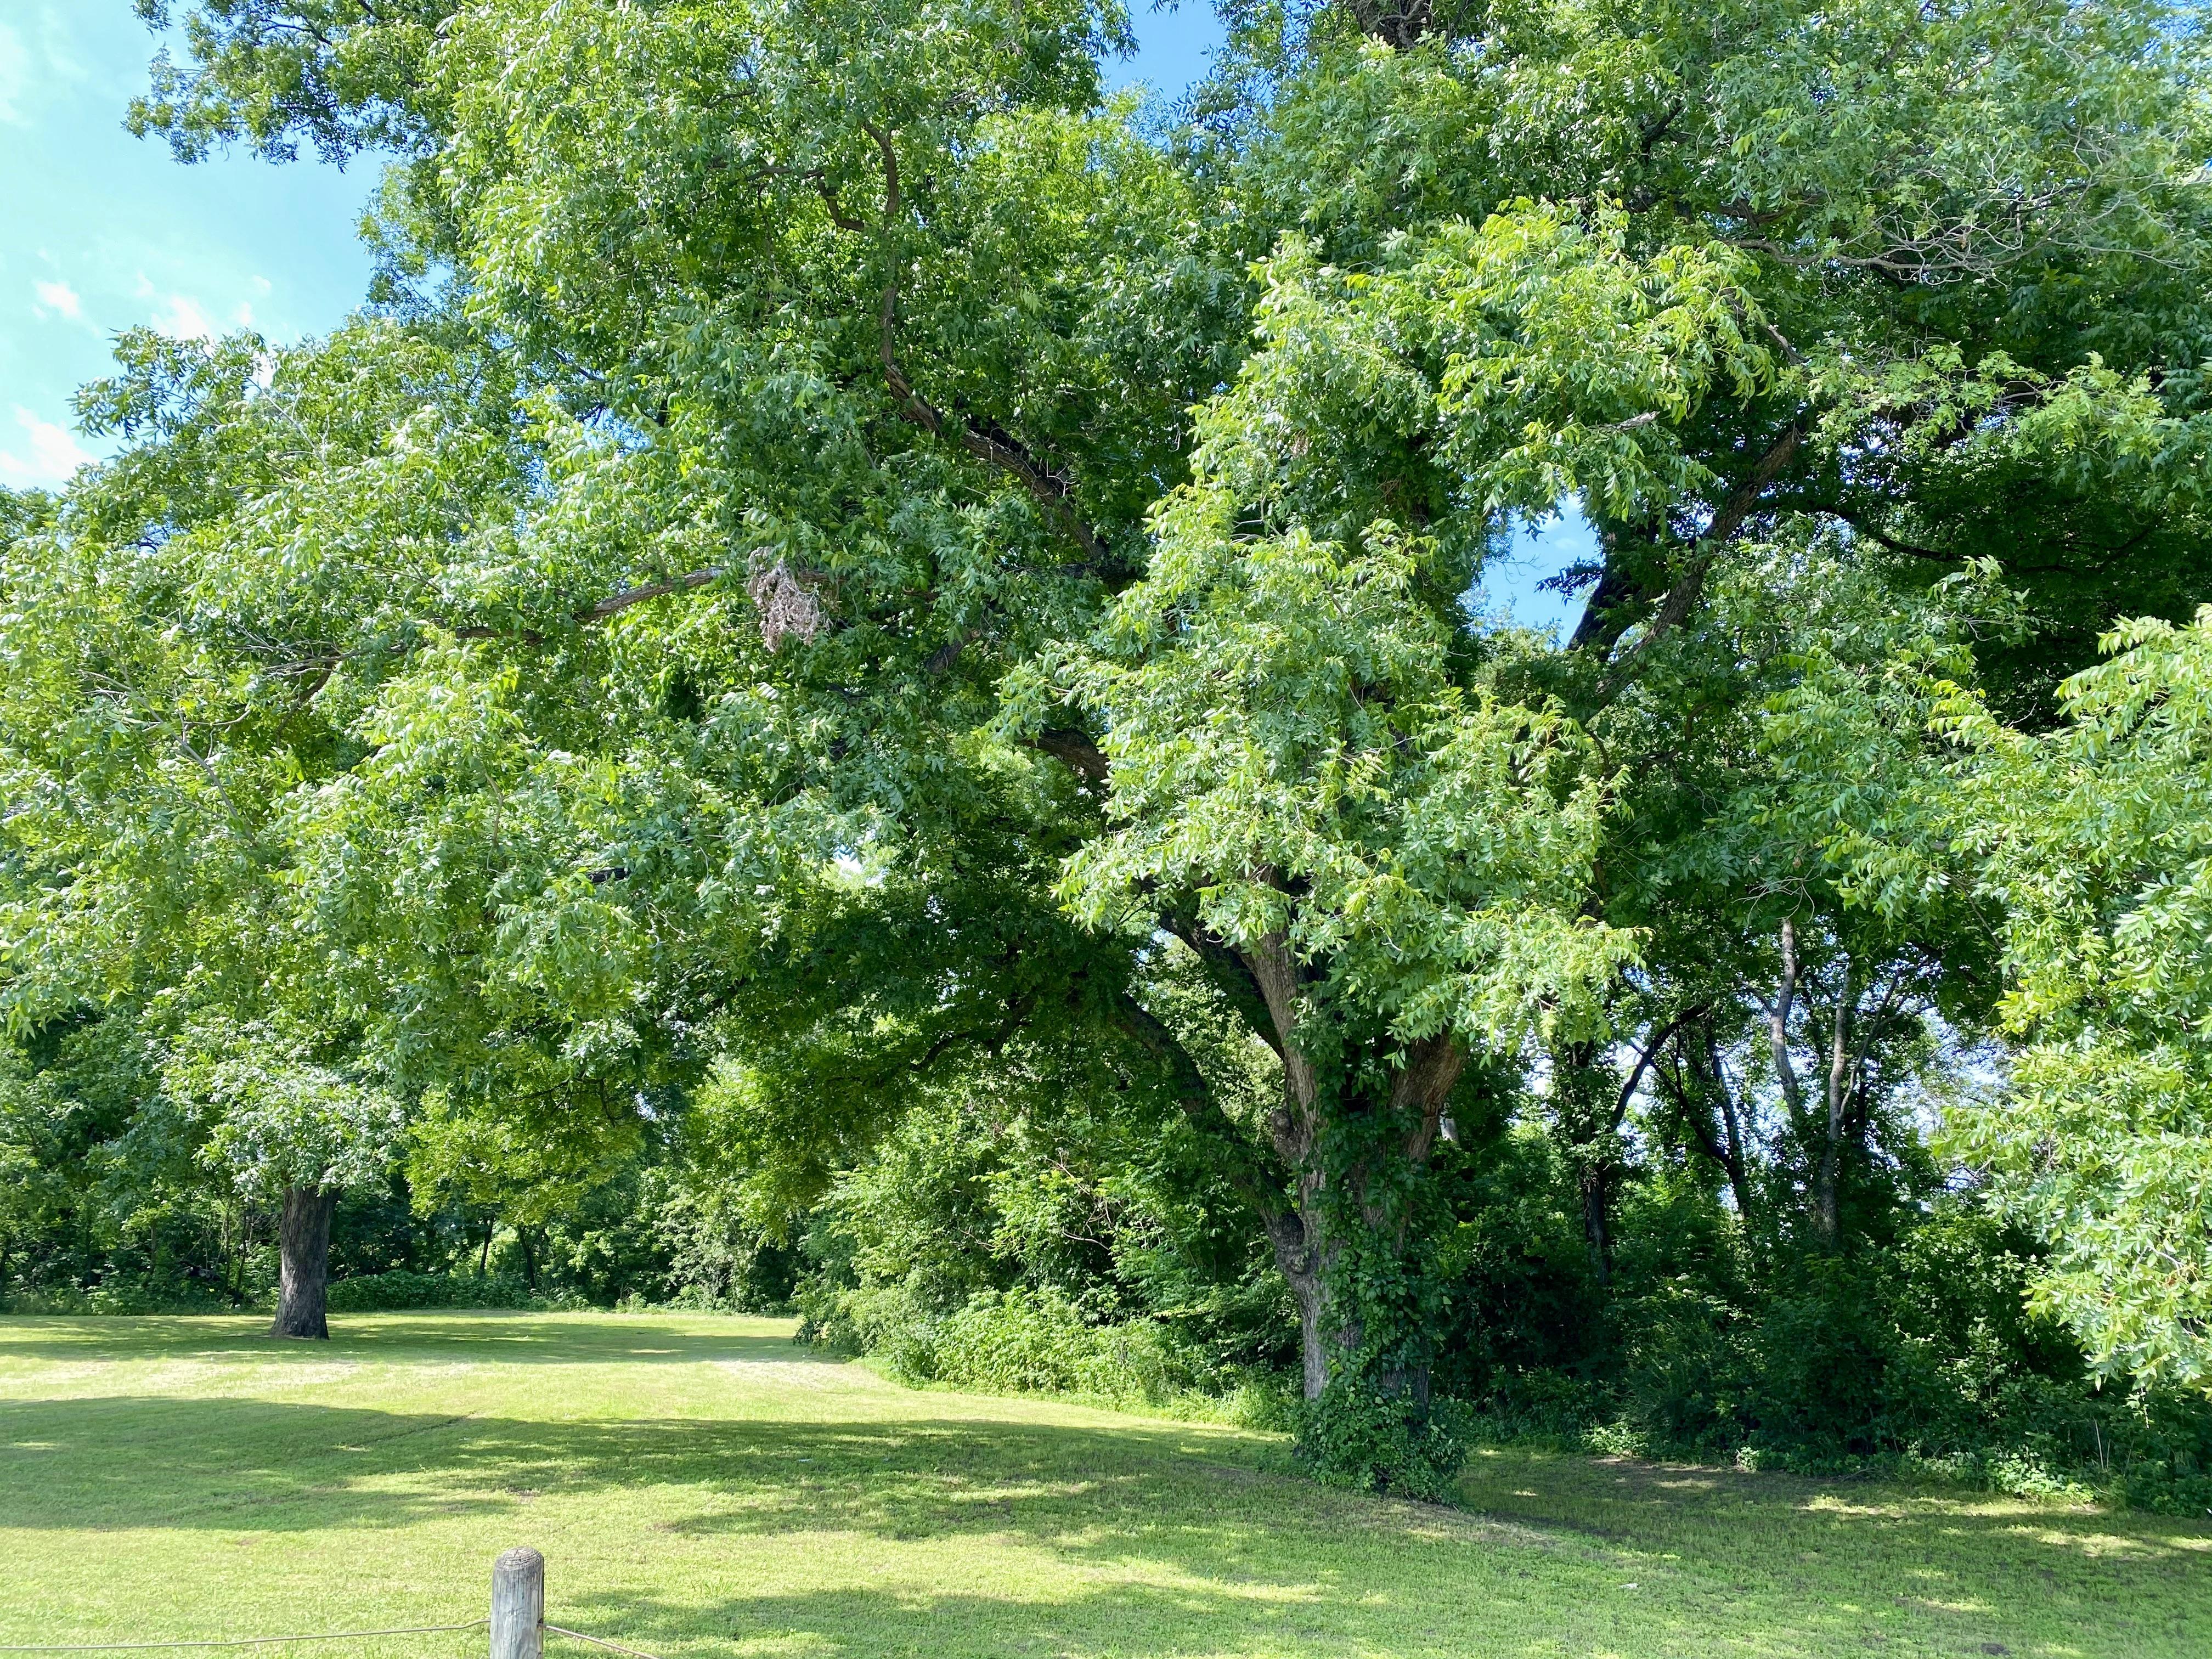 Quanah Parker Park near the Trinity River